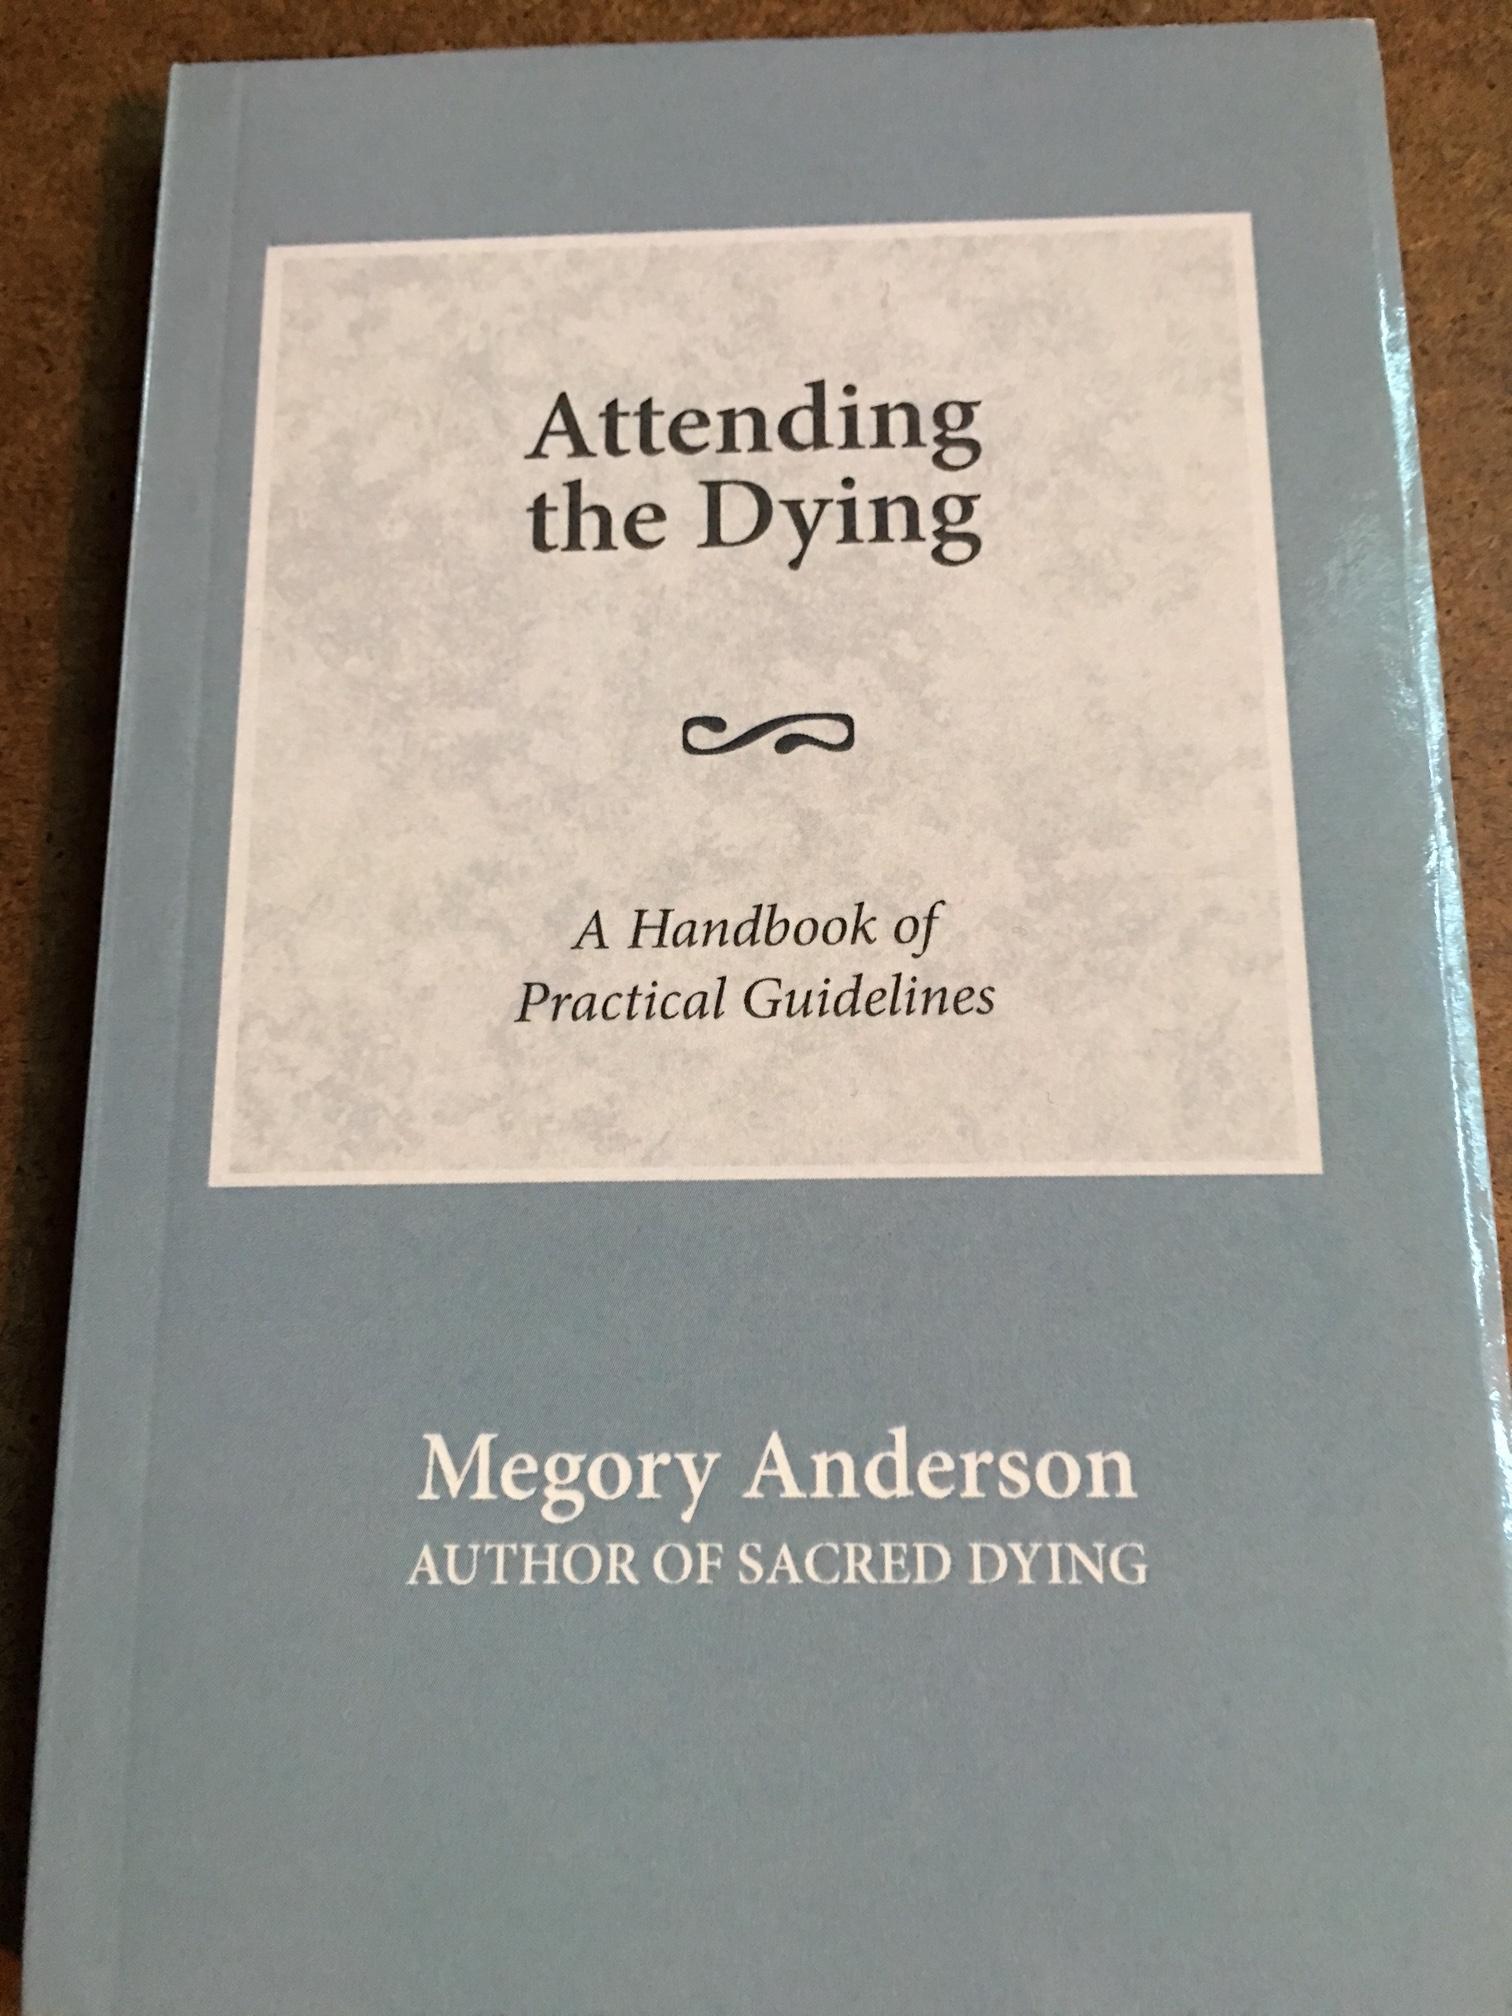 attending the dying_.JPG